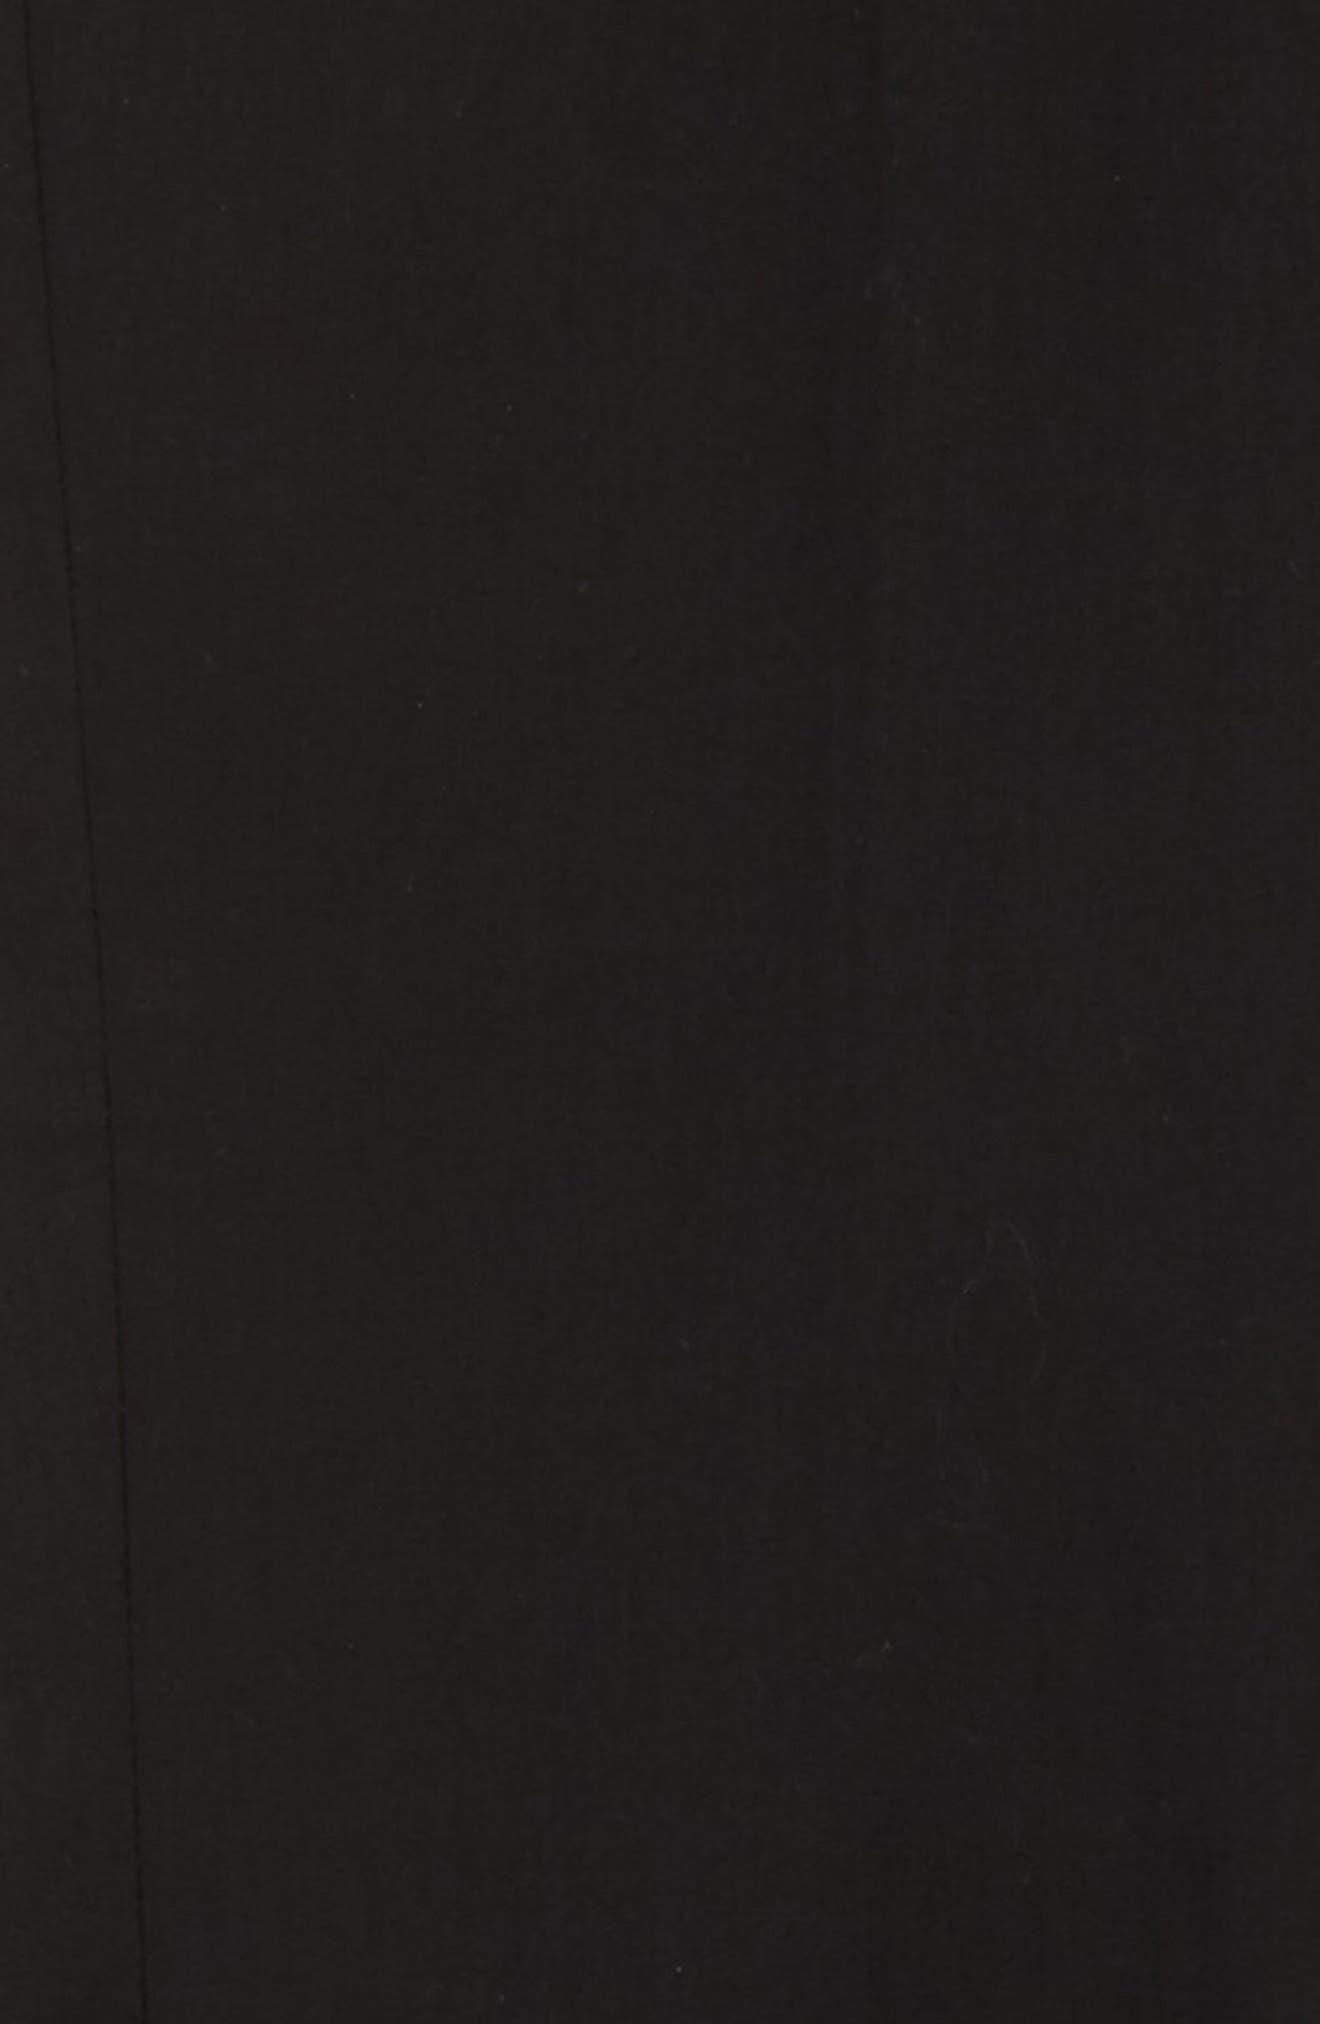 Elliott Slim Fit Flat Front Trousers,                             Alternate thumbnail 2, color,                             BLACK